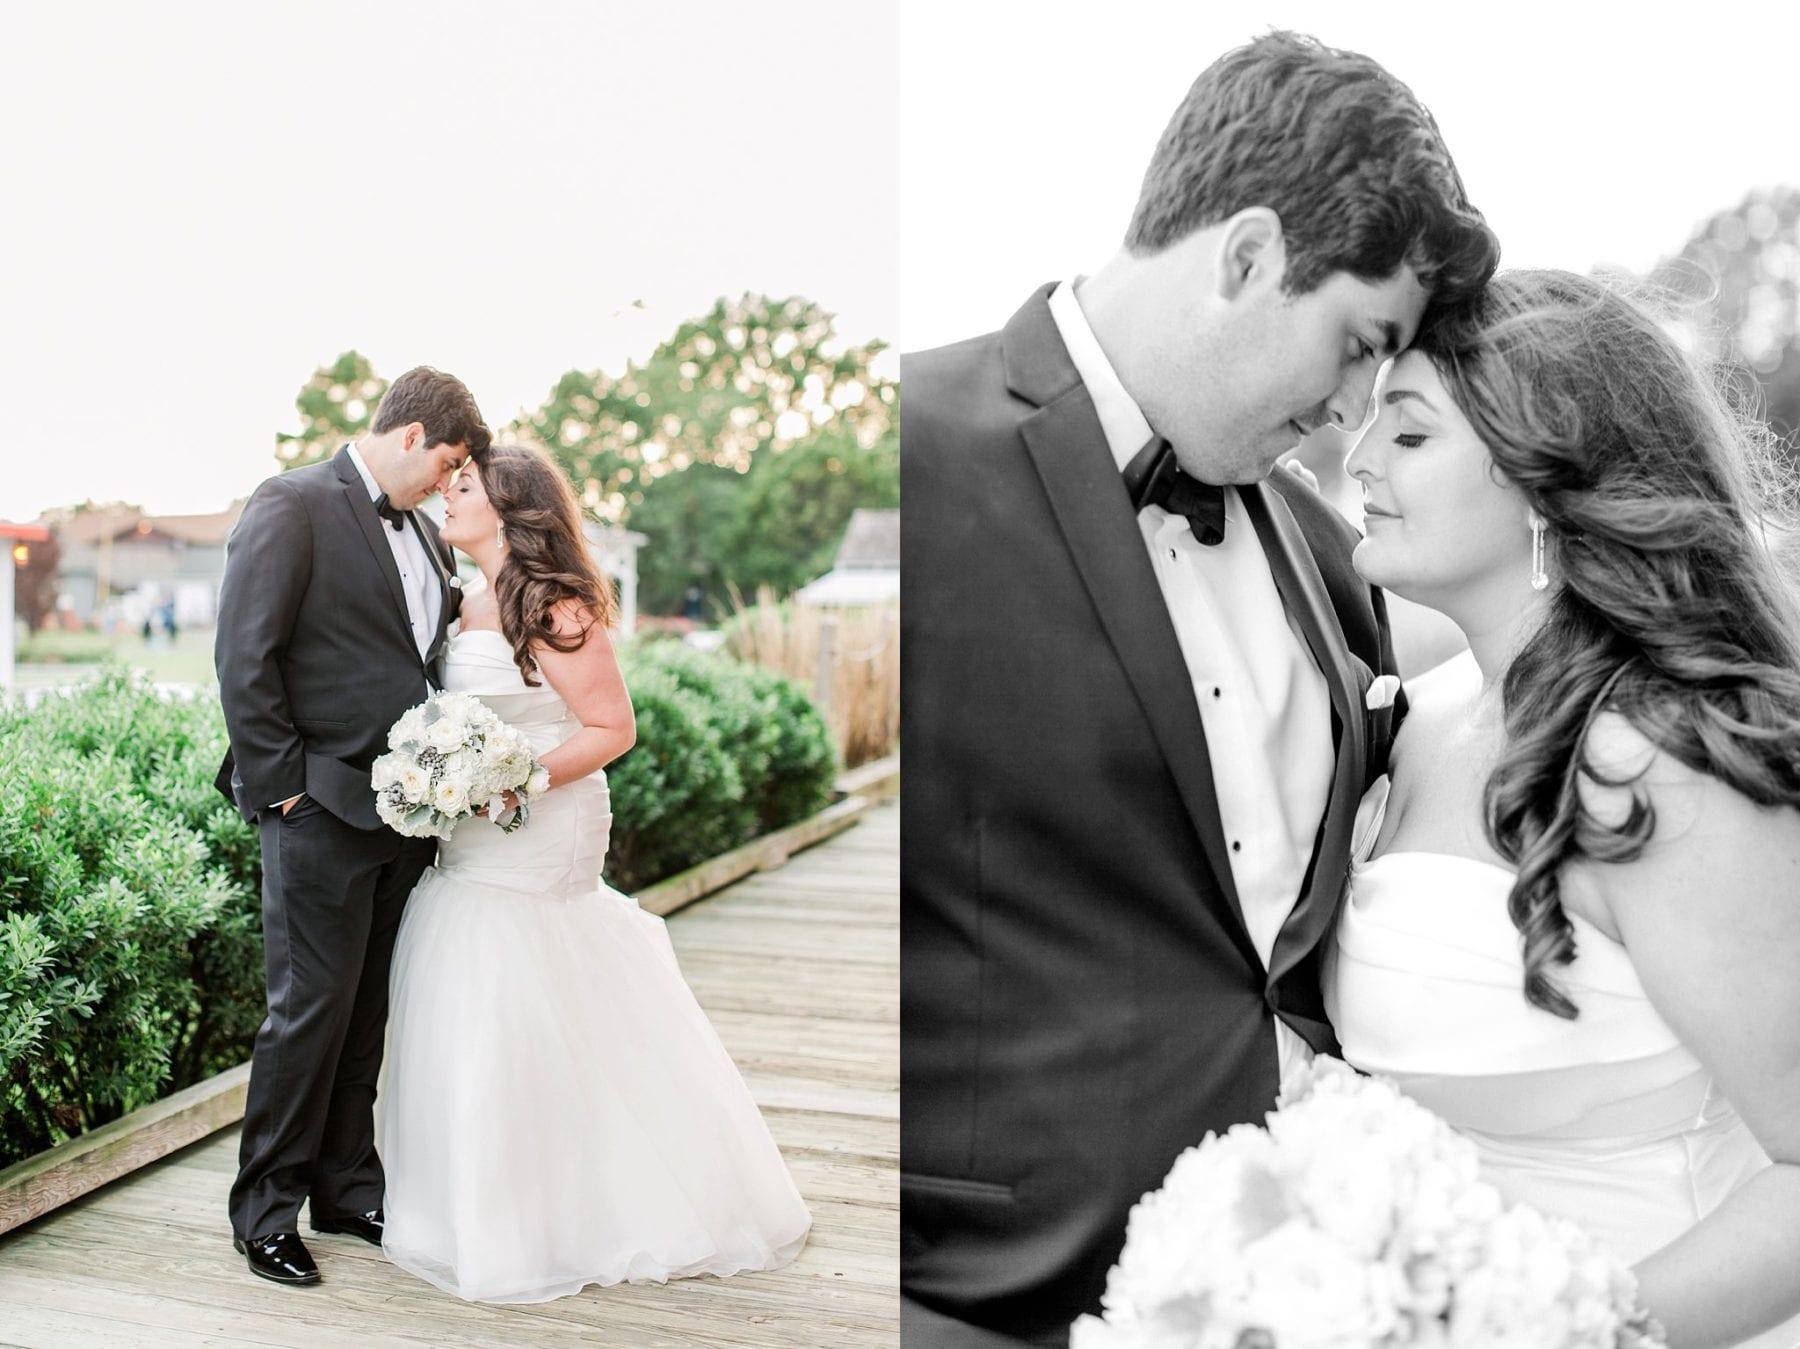 Chesapeake Bay Maritime Museum Wedding Photos Maryland Wedding Photographer Megan Kelsey Photography Halie & Mike-185.jpg